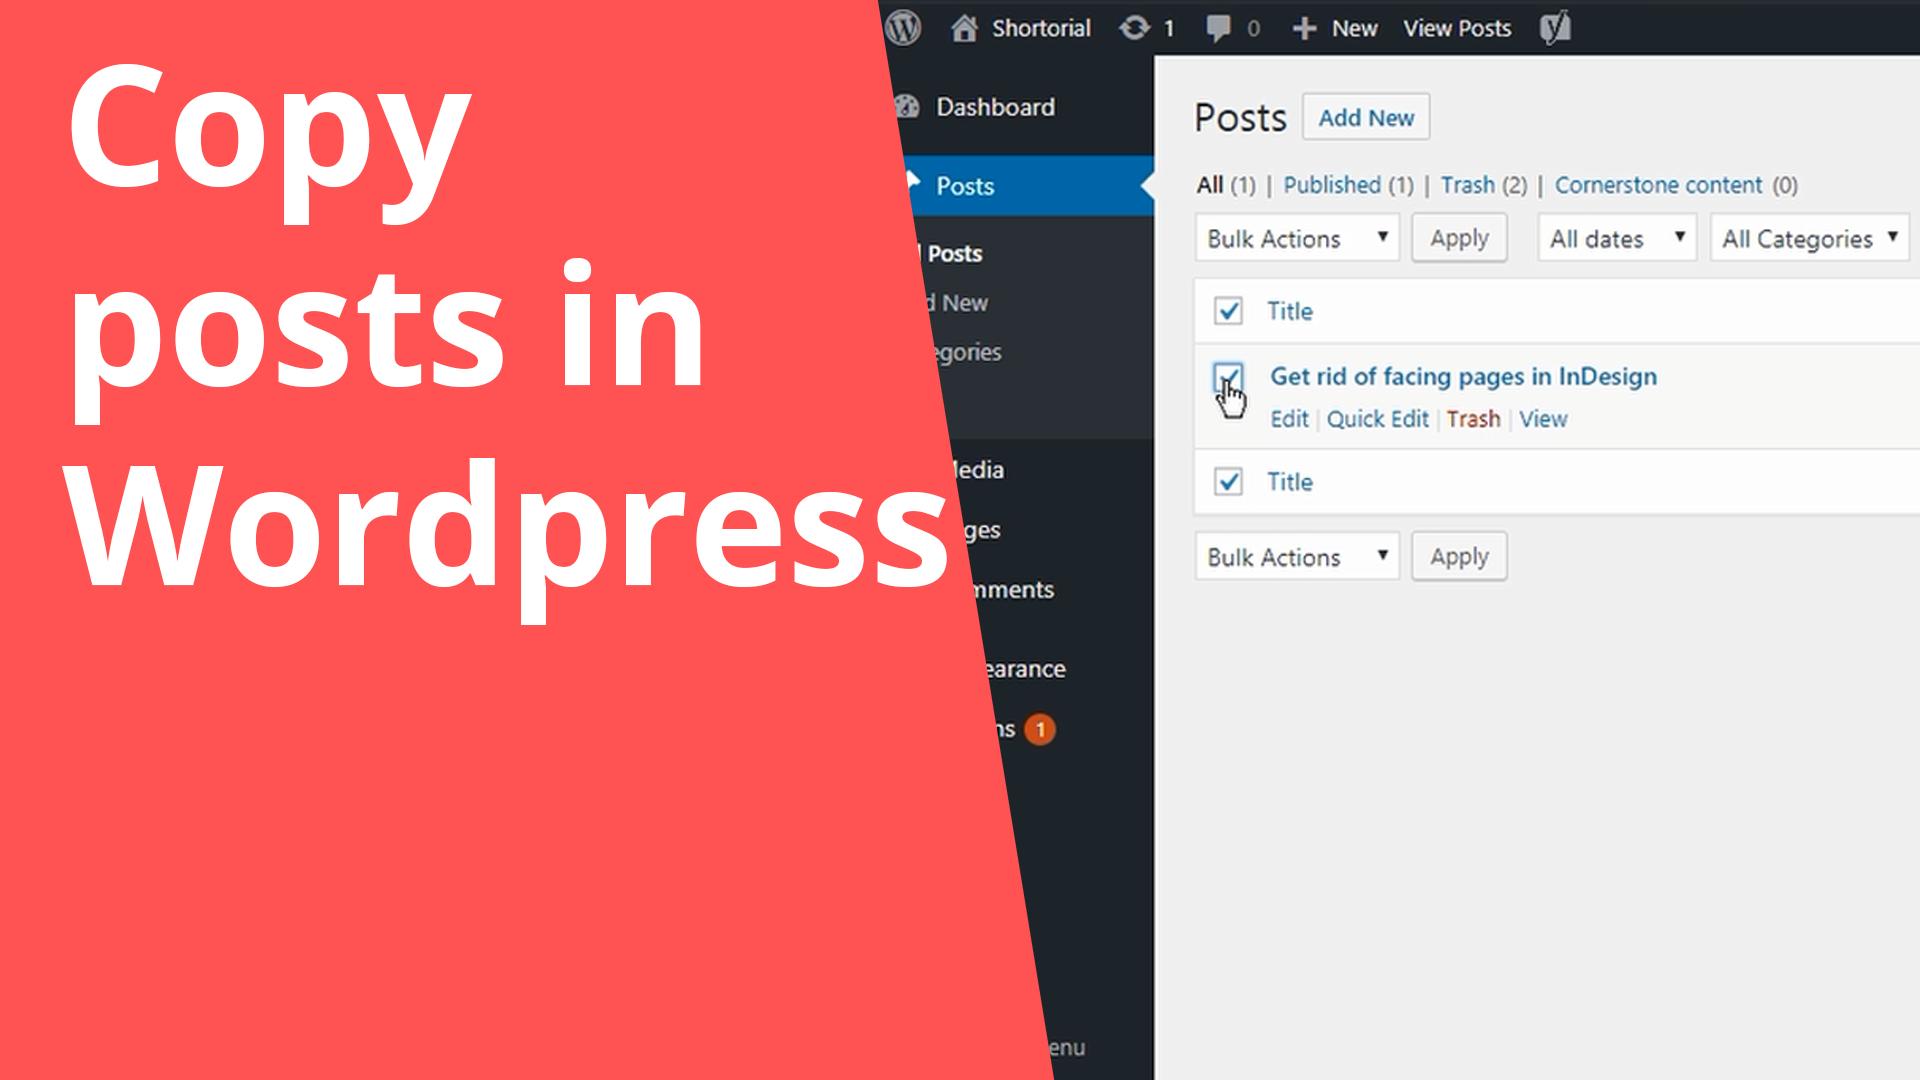 Copy posts in Wordpress